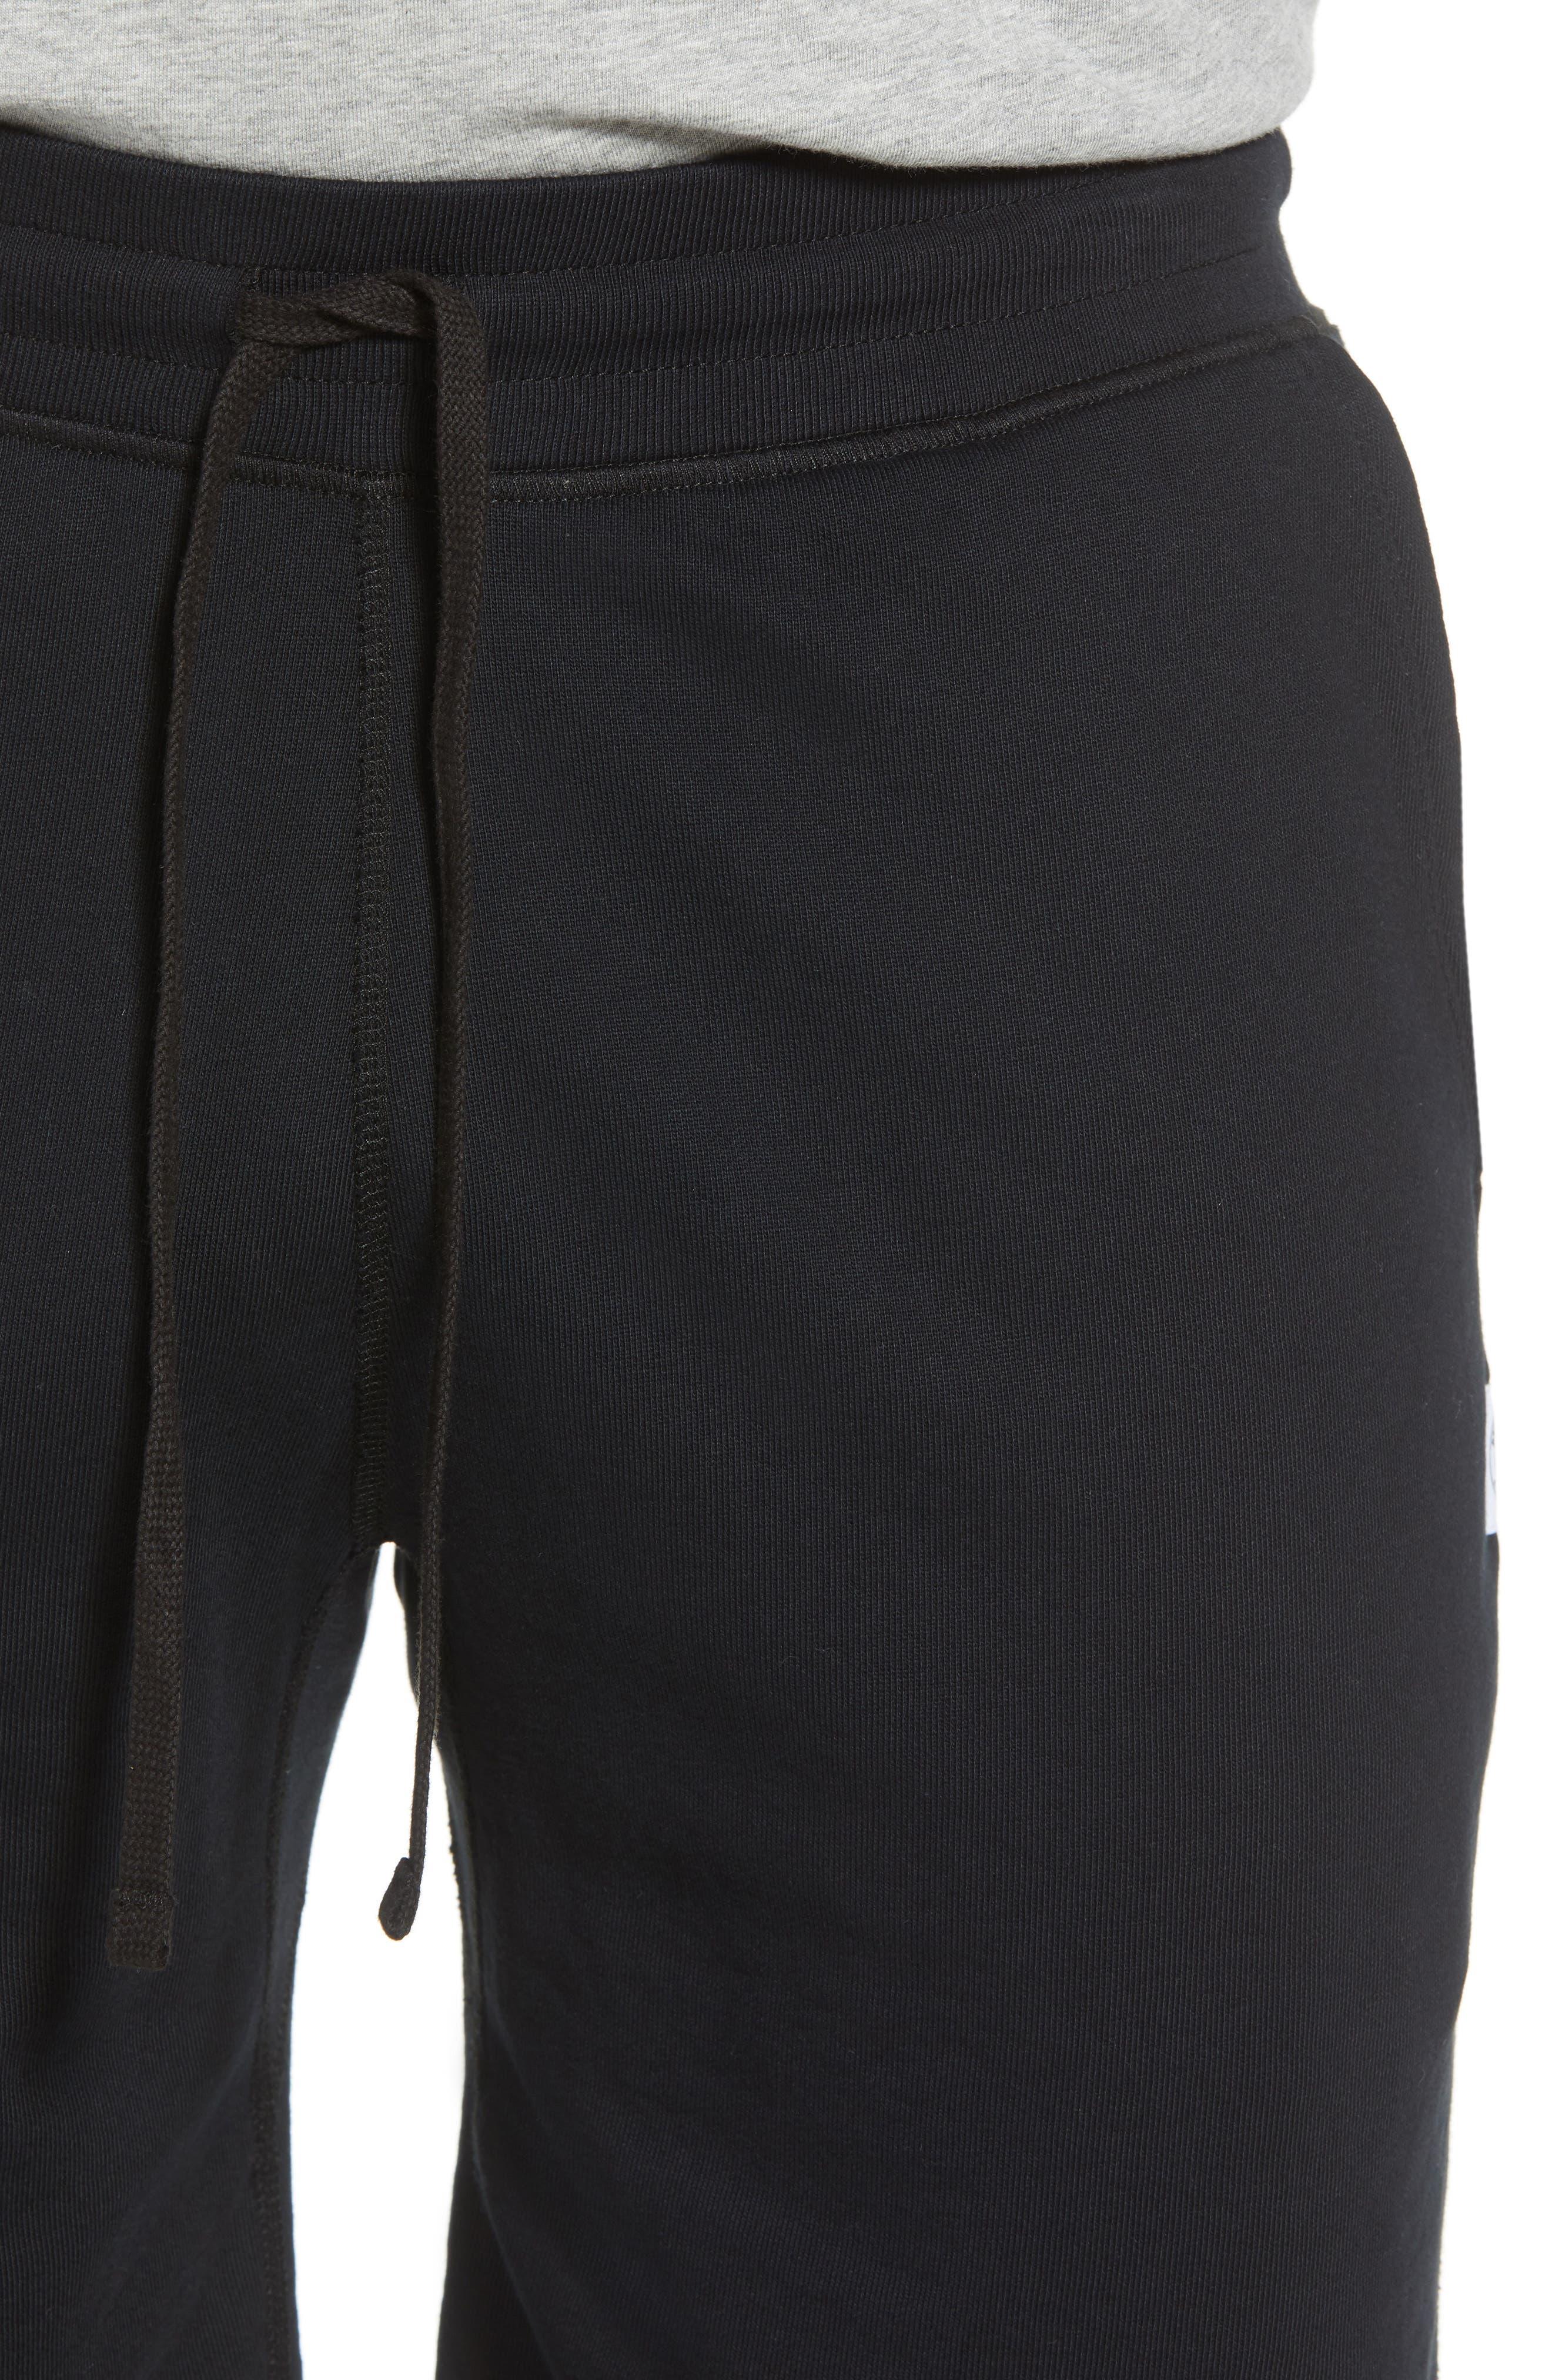 Shorts Lightweight Classic Fit Knit Shorts,                             Alternate thumbnail 4, color,                             BLACK